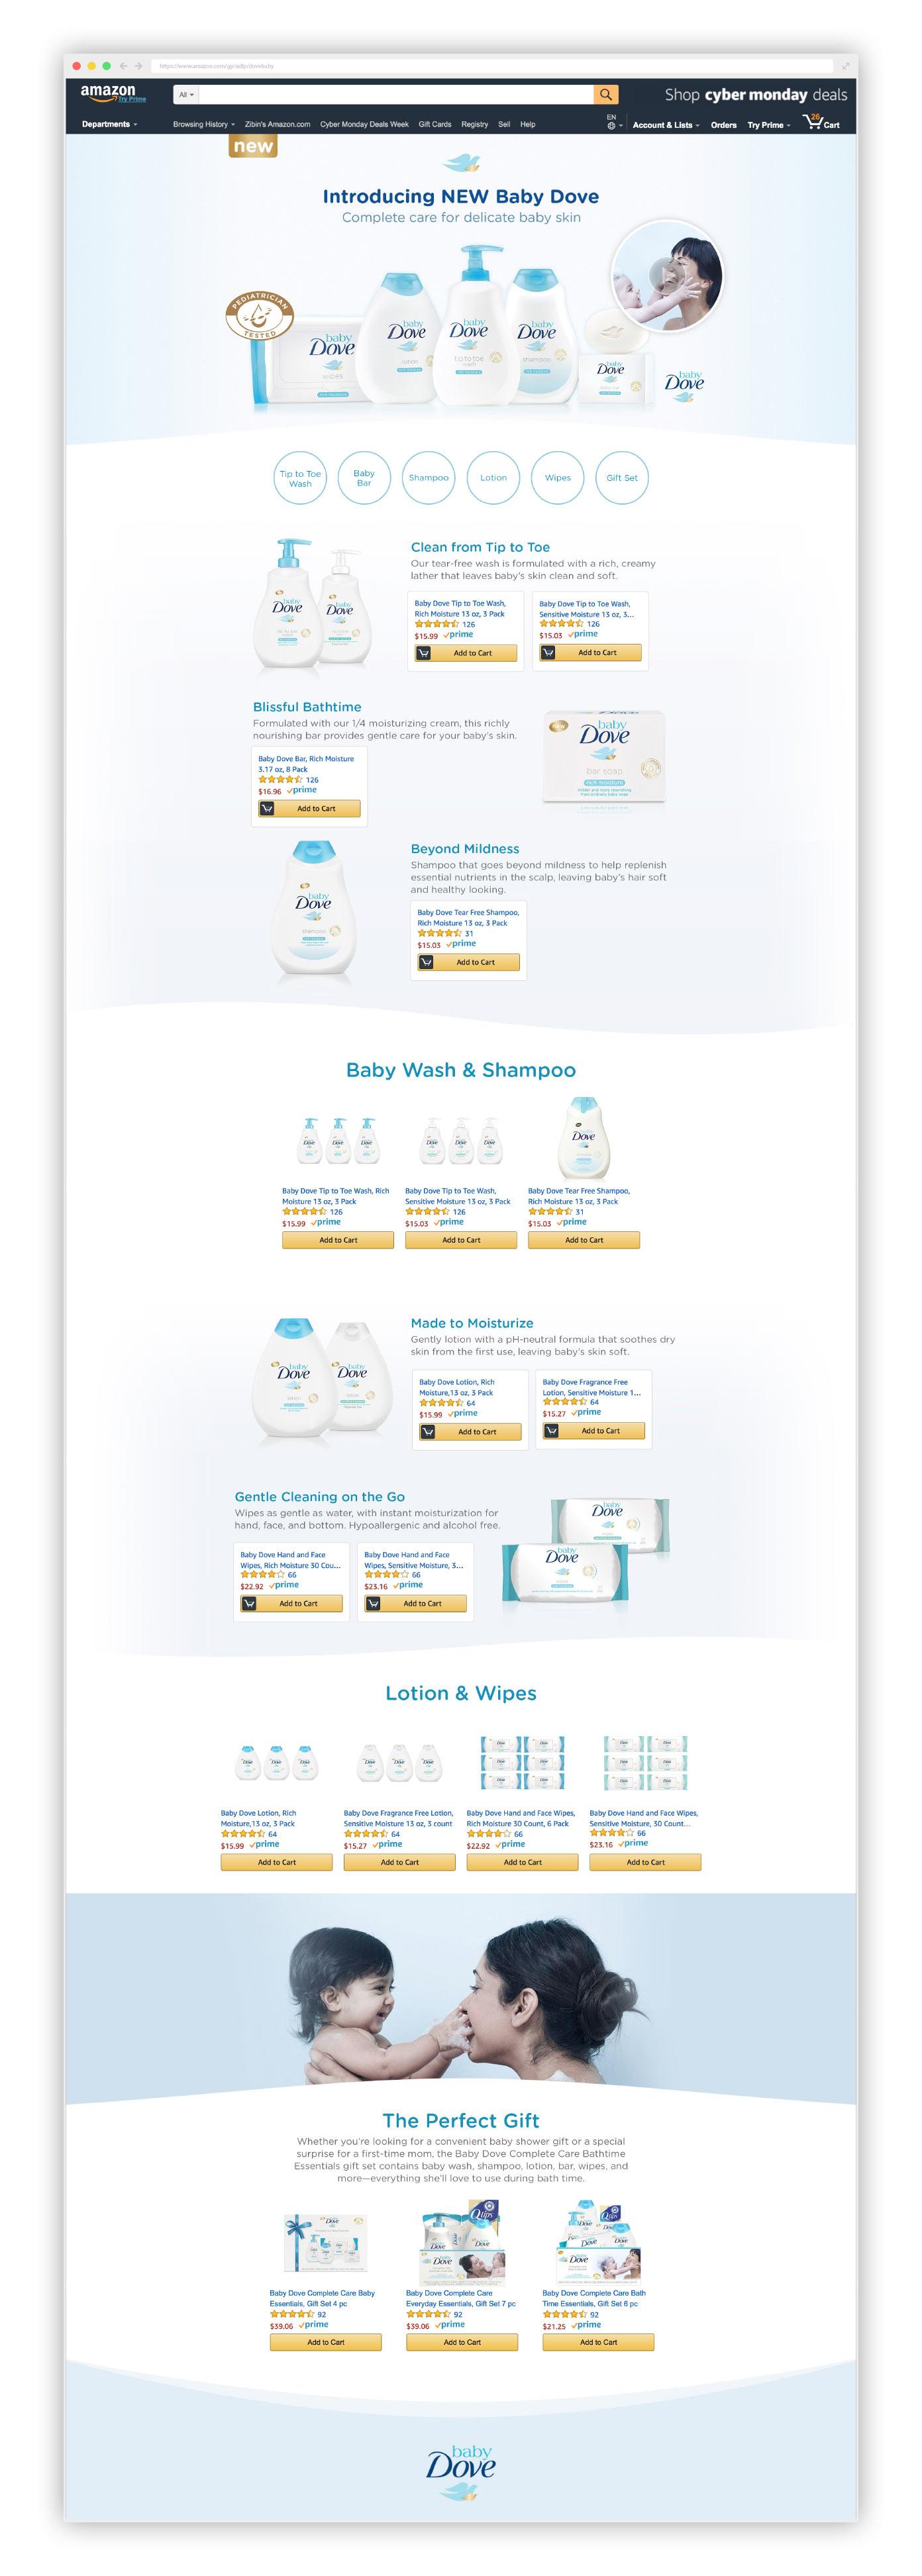 BabyDove Custom Campaign Landing Page, Digital, 3000px x8740 px